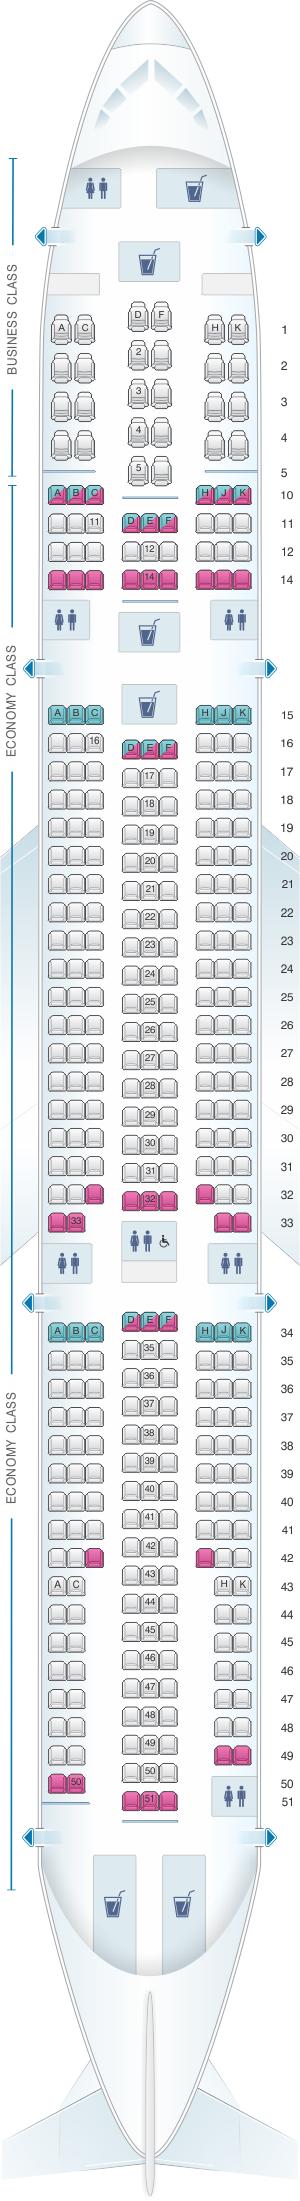 Plan de cabine corsair airbus a330 300 for Interieur 747 corsair